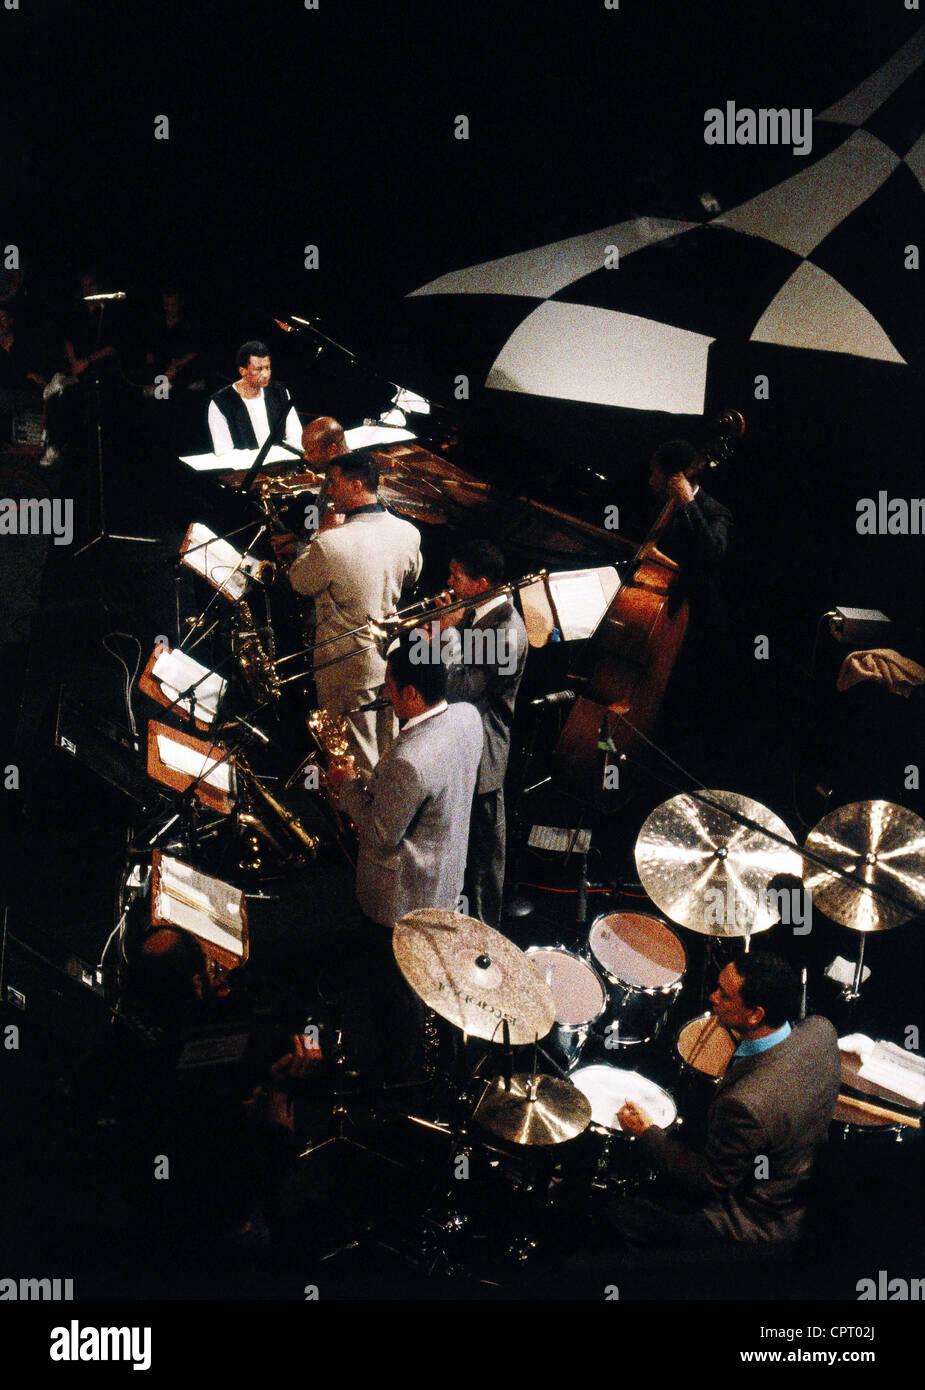 Ibrahim, Abdullah (Brand, Adolphe), * 9.1.1934, South African musician, stage performance with 'Ibrahim Abdullah - Stock Image